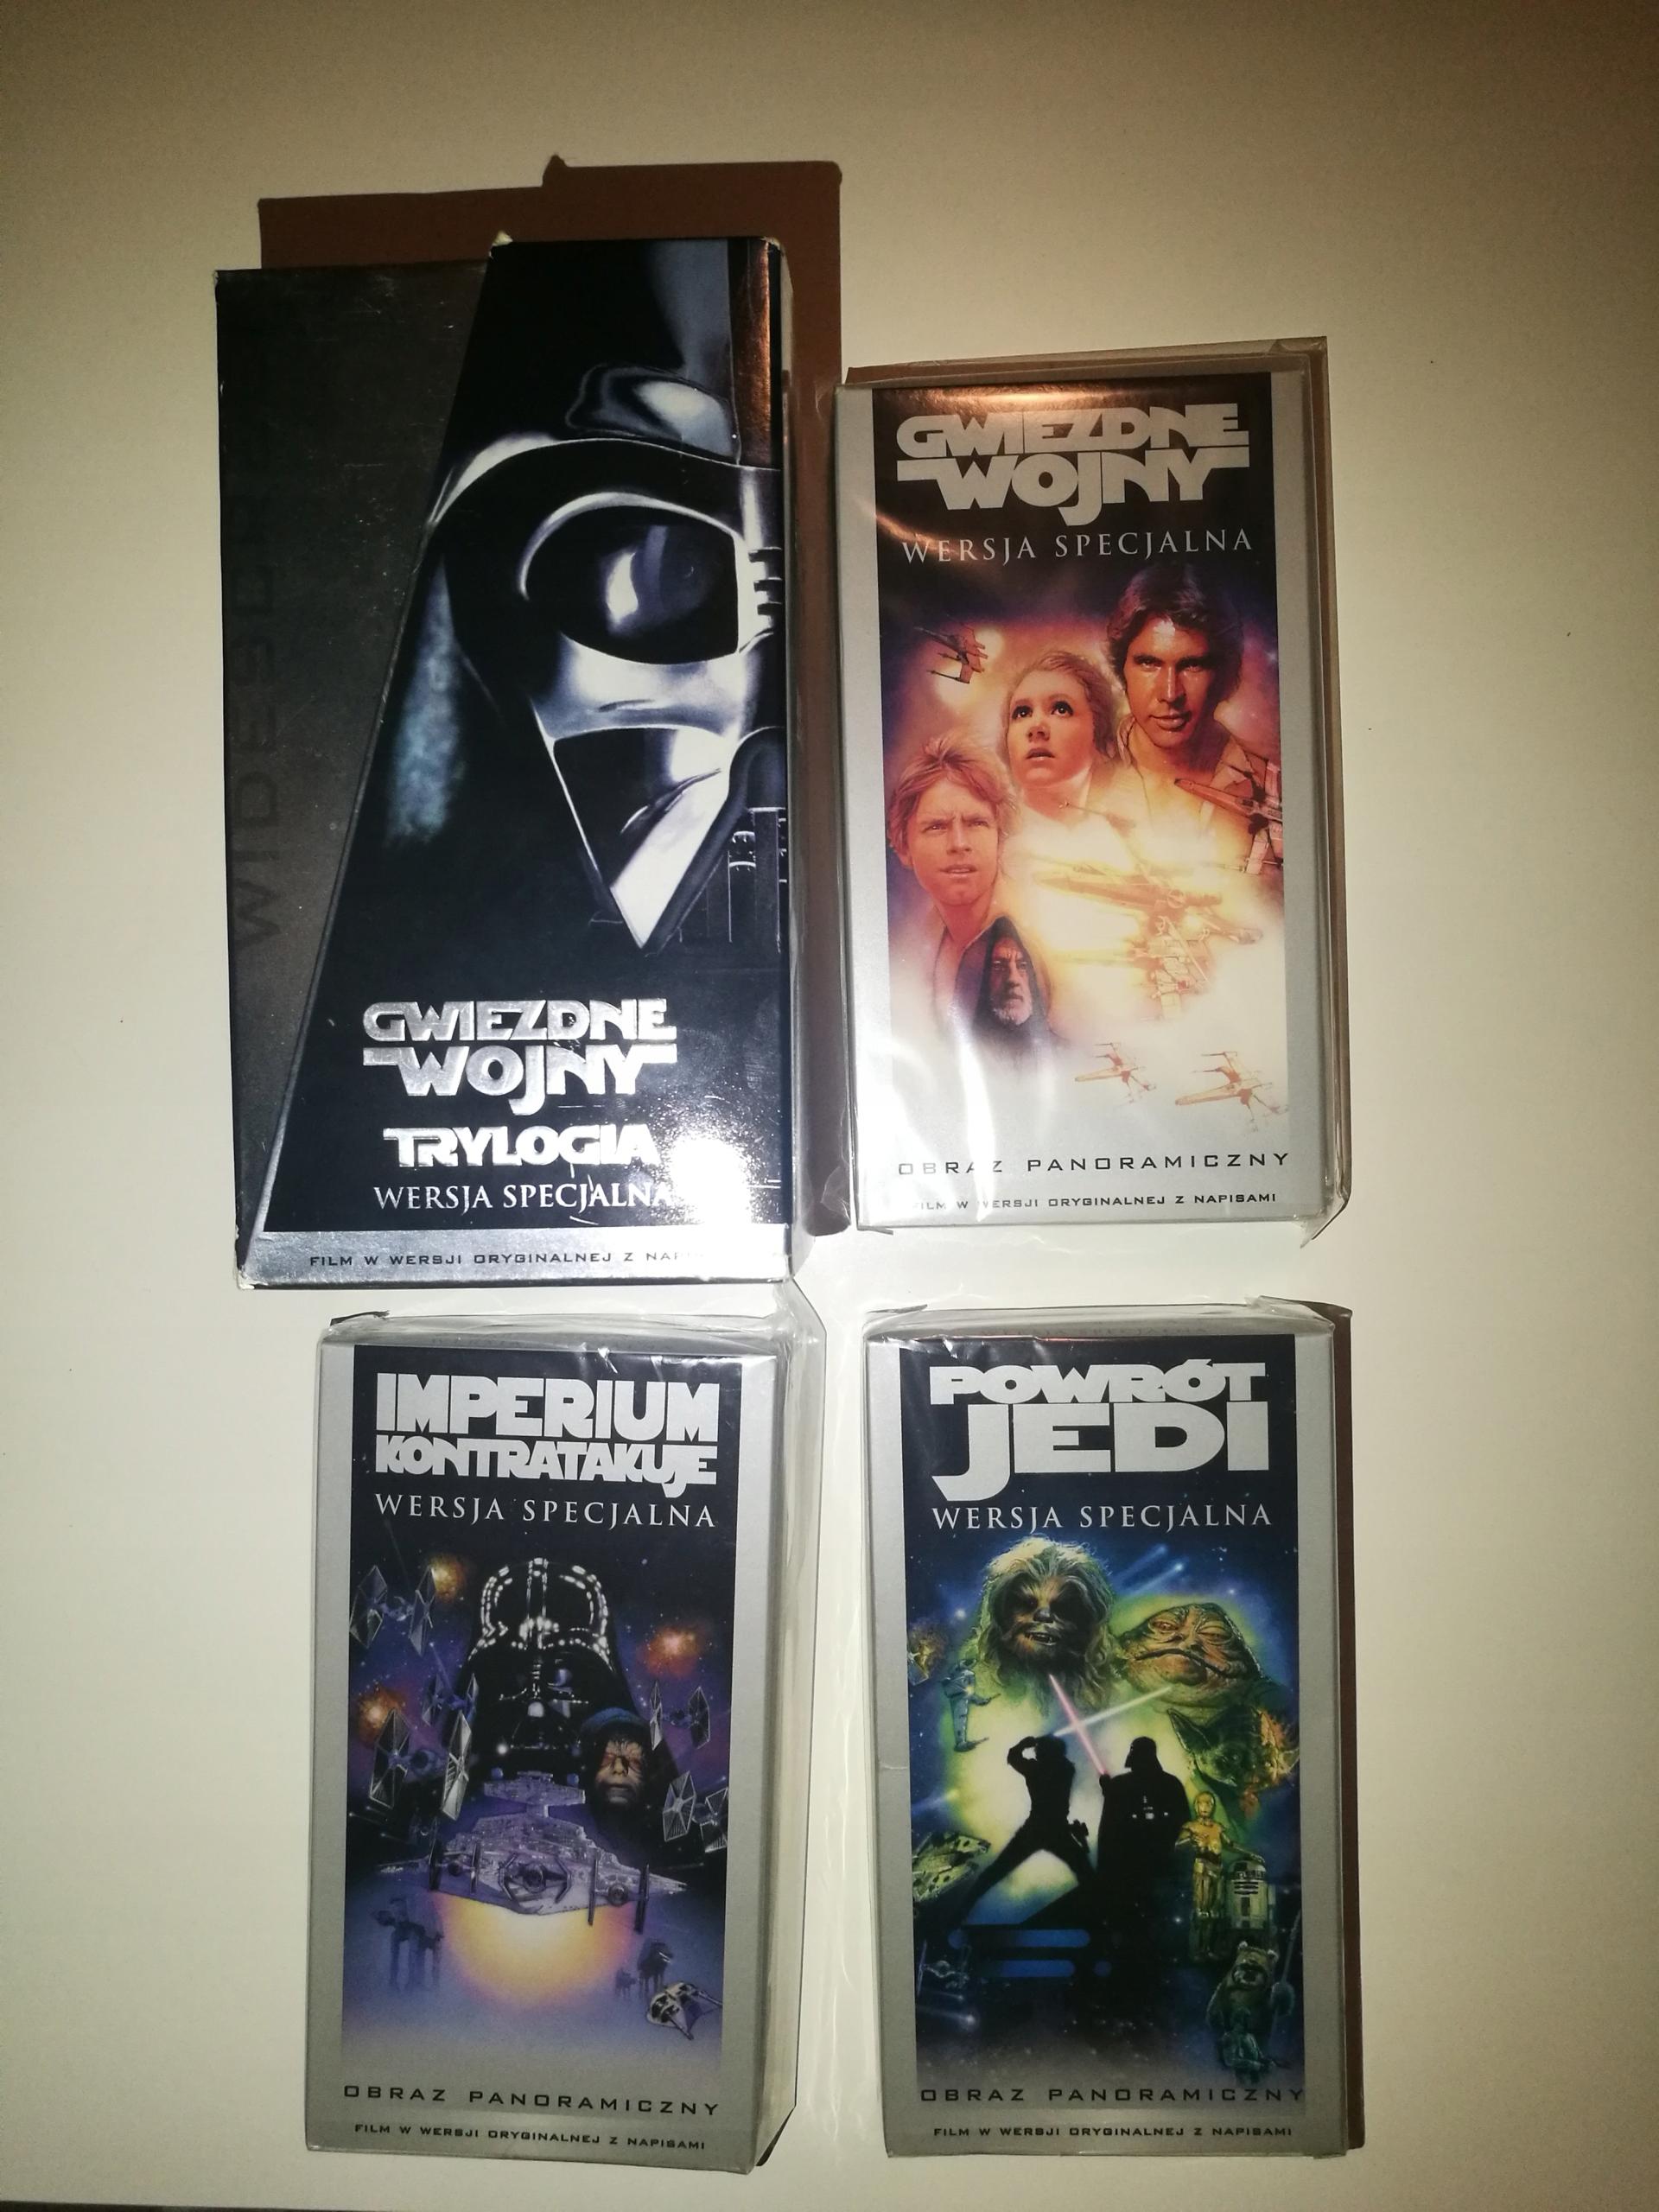 Item A set of VHS tapes Star Wars Star Wars Trilogy